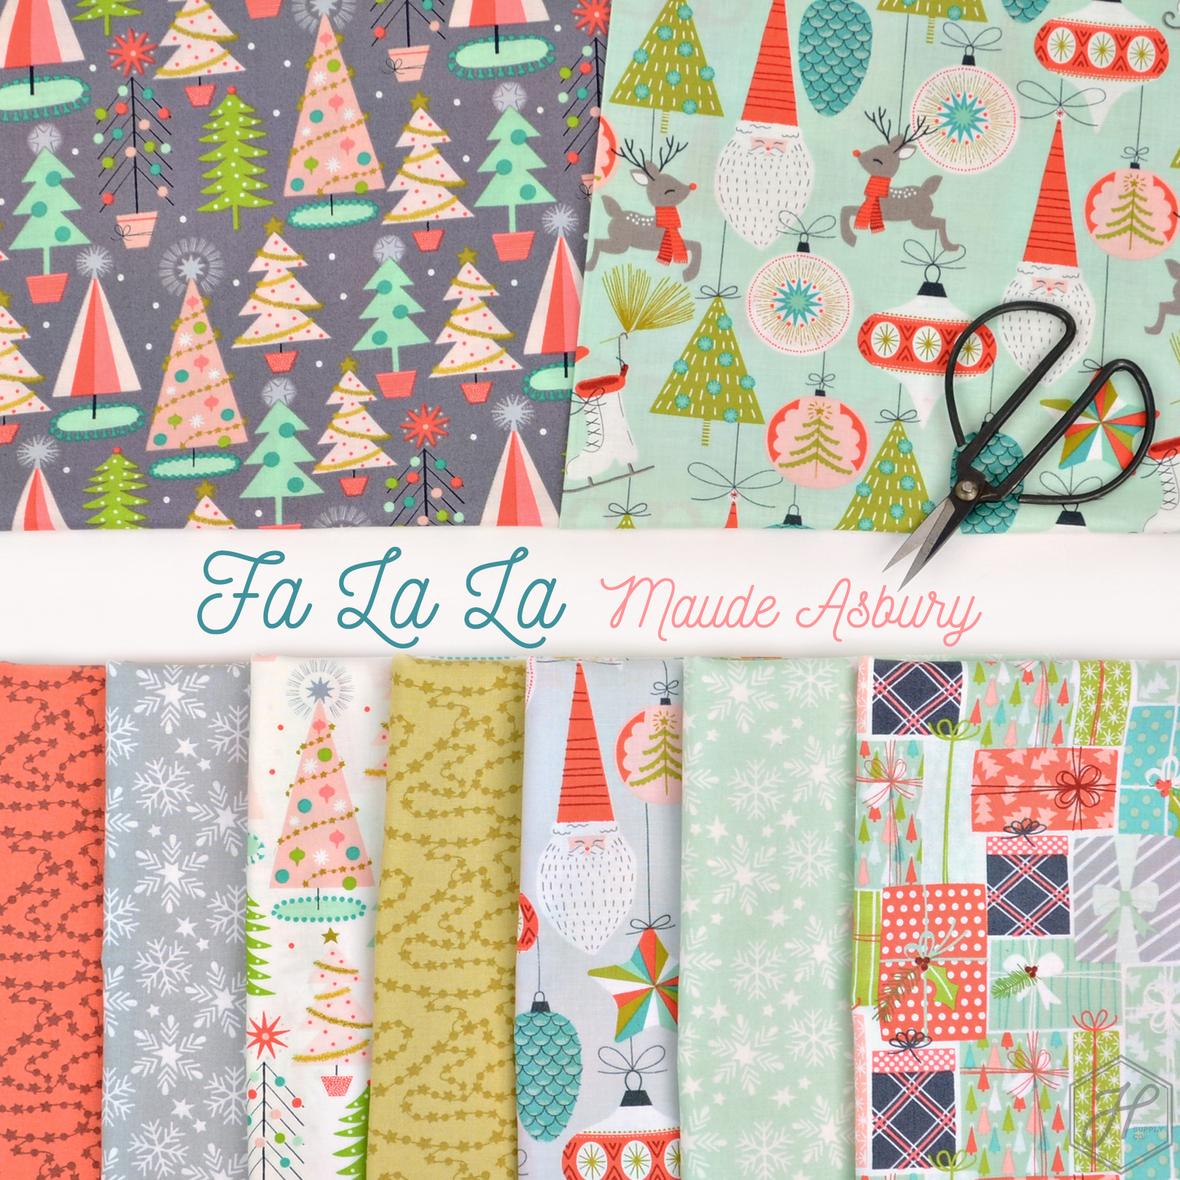 Fa La La fabric collection by Maude Asbury at Hawthorne Supply Co